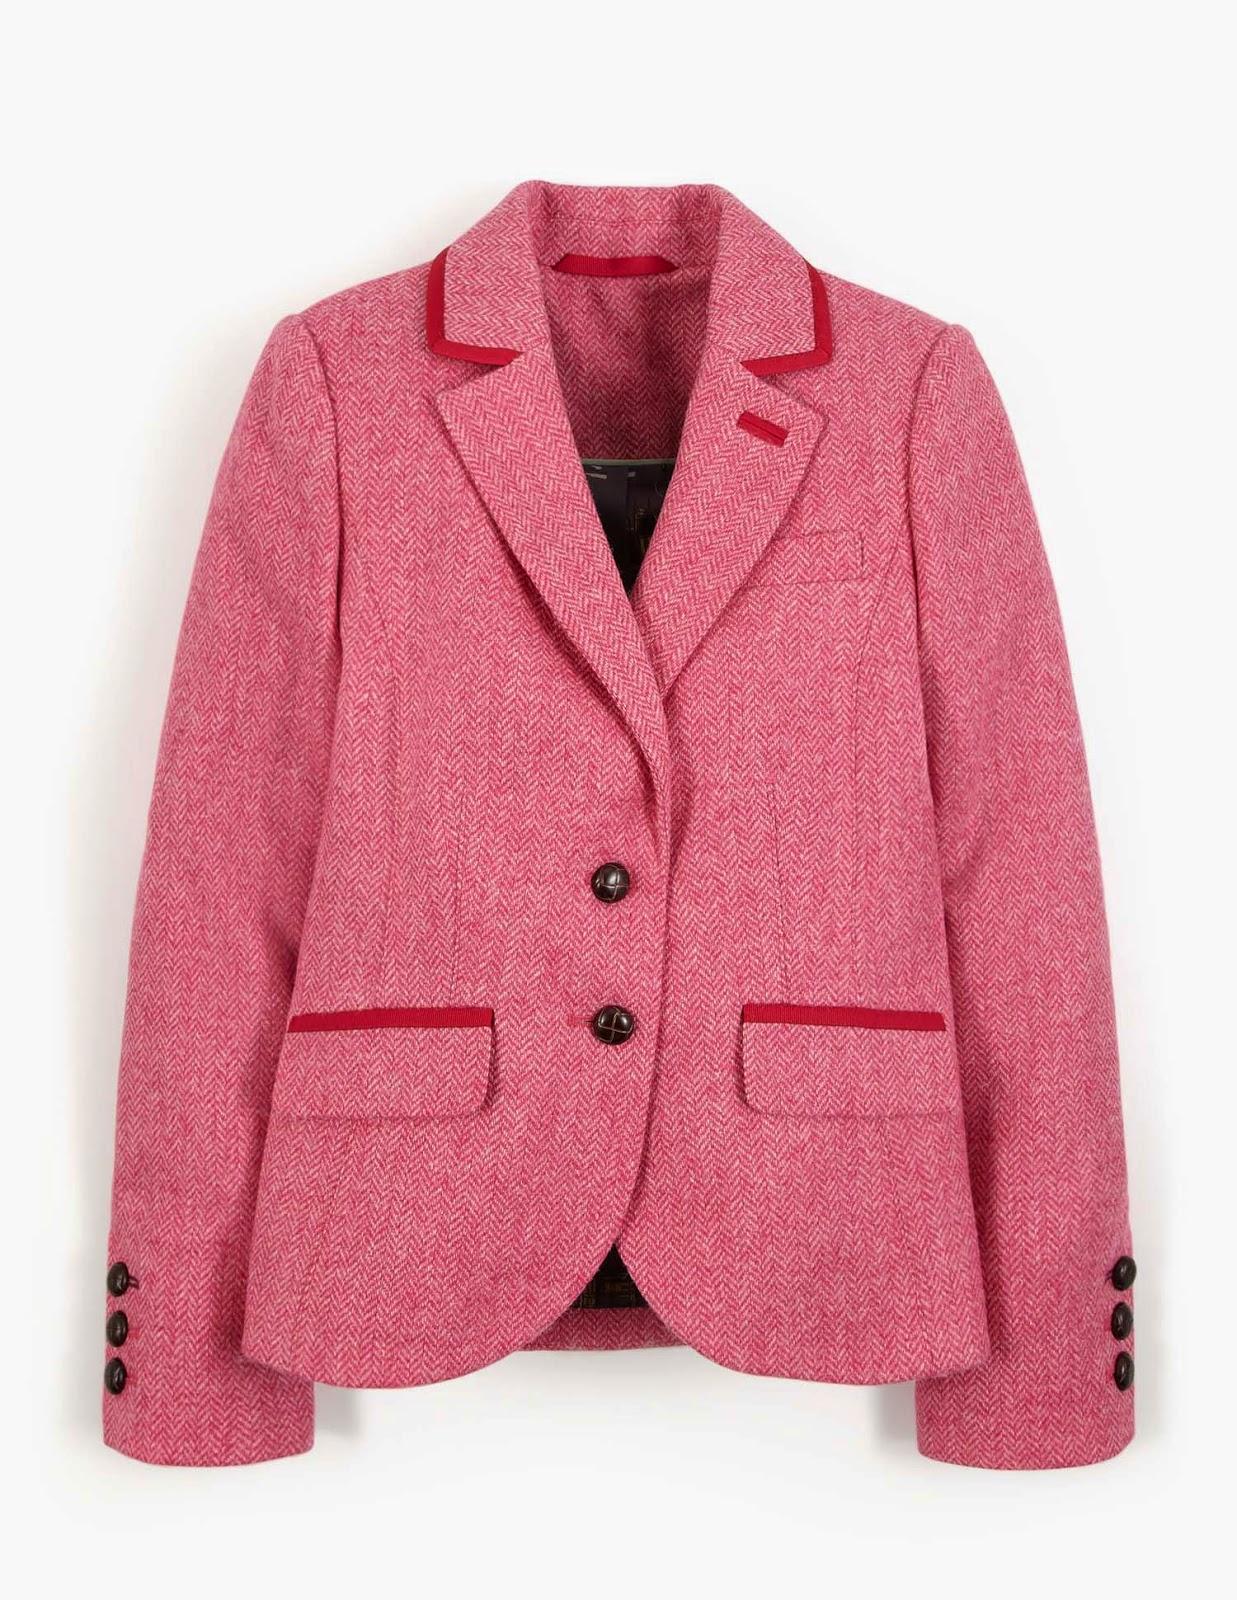 62a757c0c9 British Tweed Blazer. I know I can t shut up about my J. Crew Bella Jacket  in Pink Herringbone